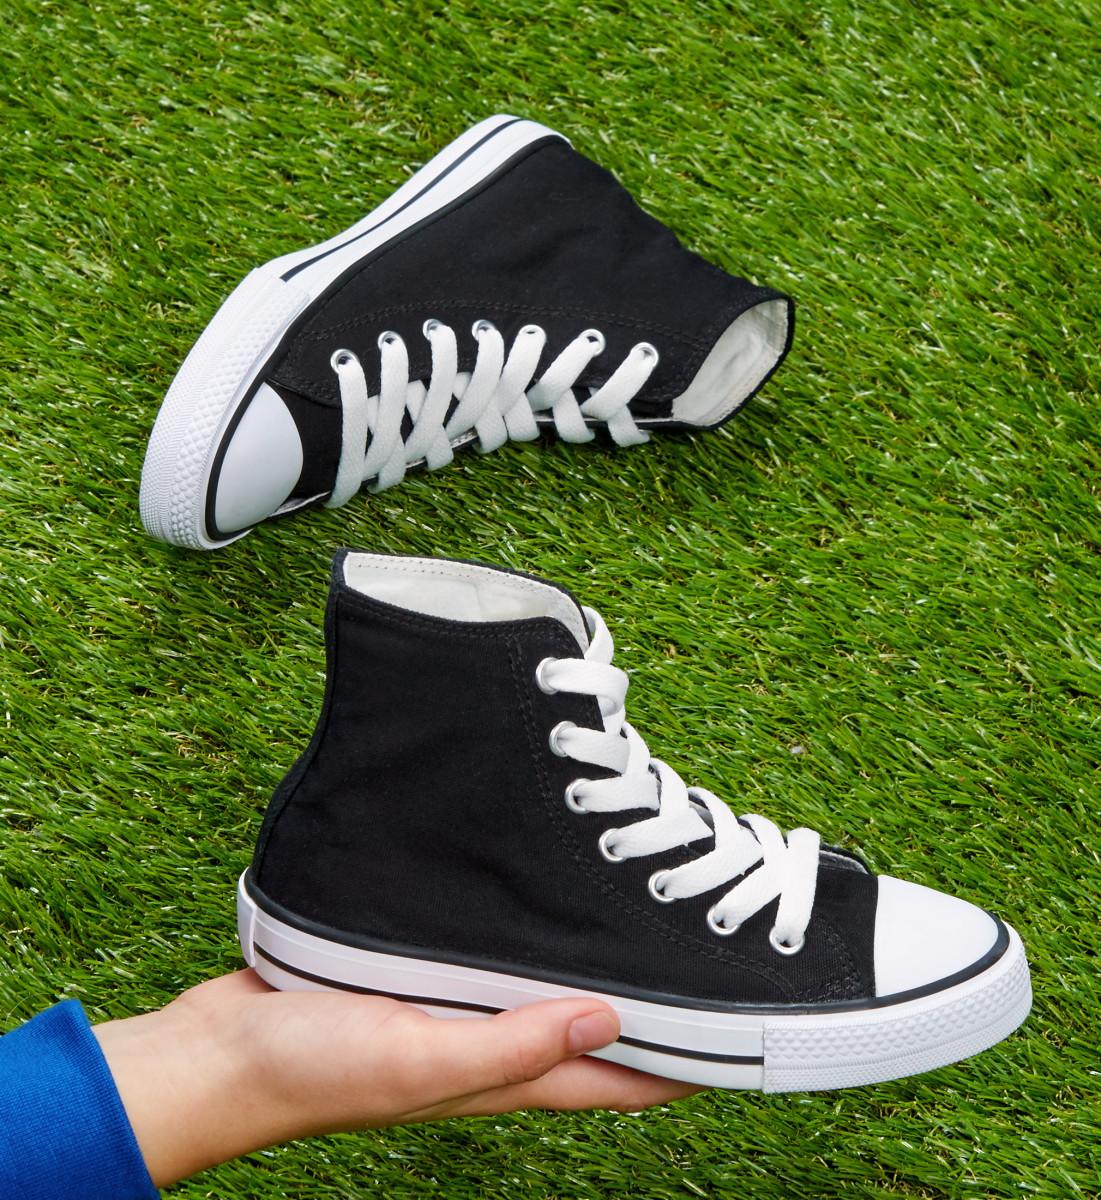 SG Footprints Junior High Top Shoe